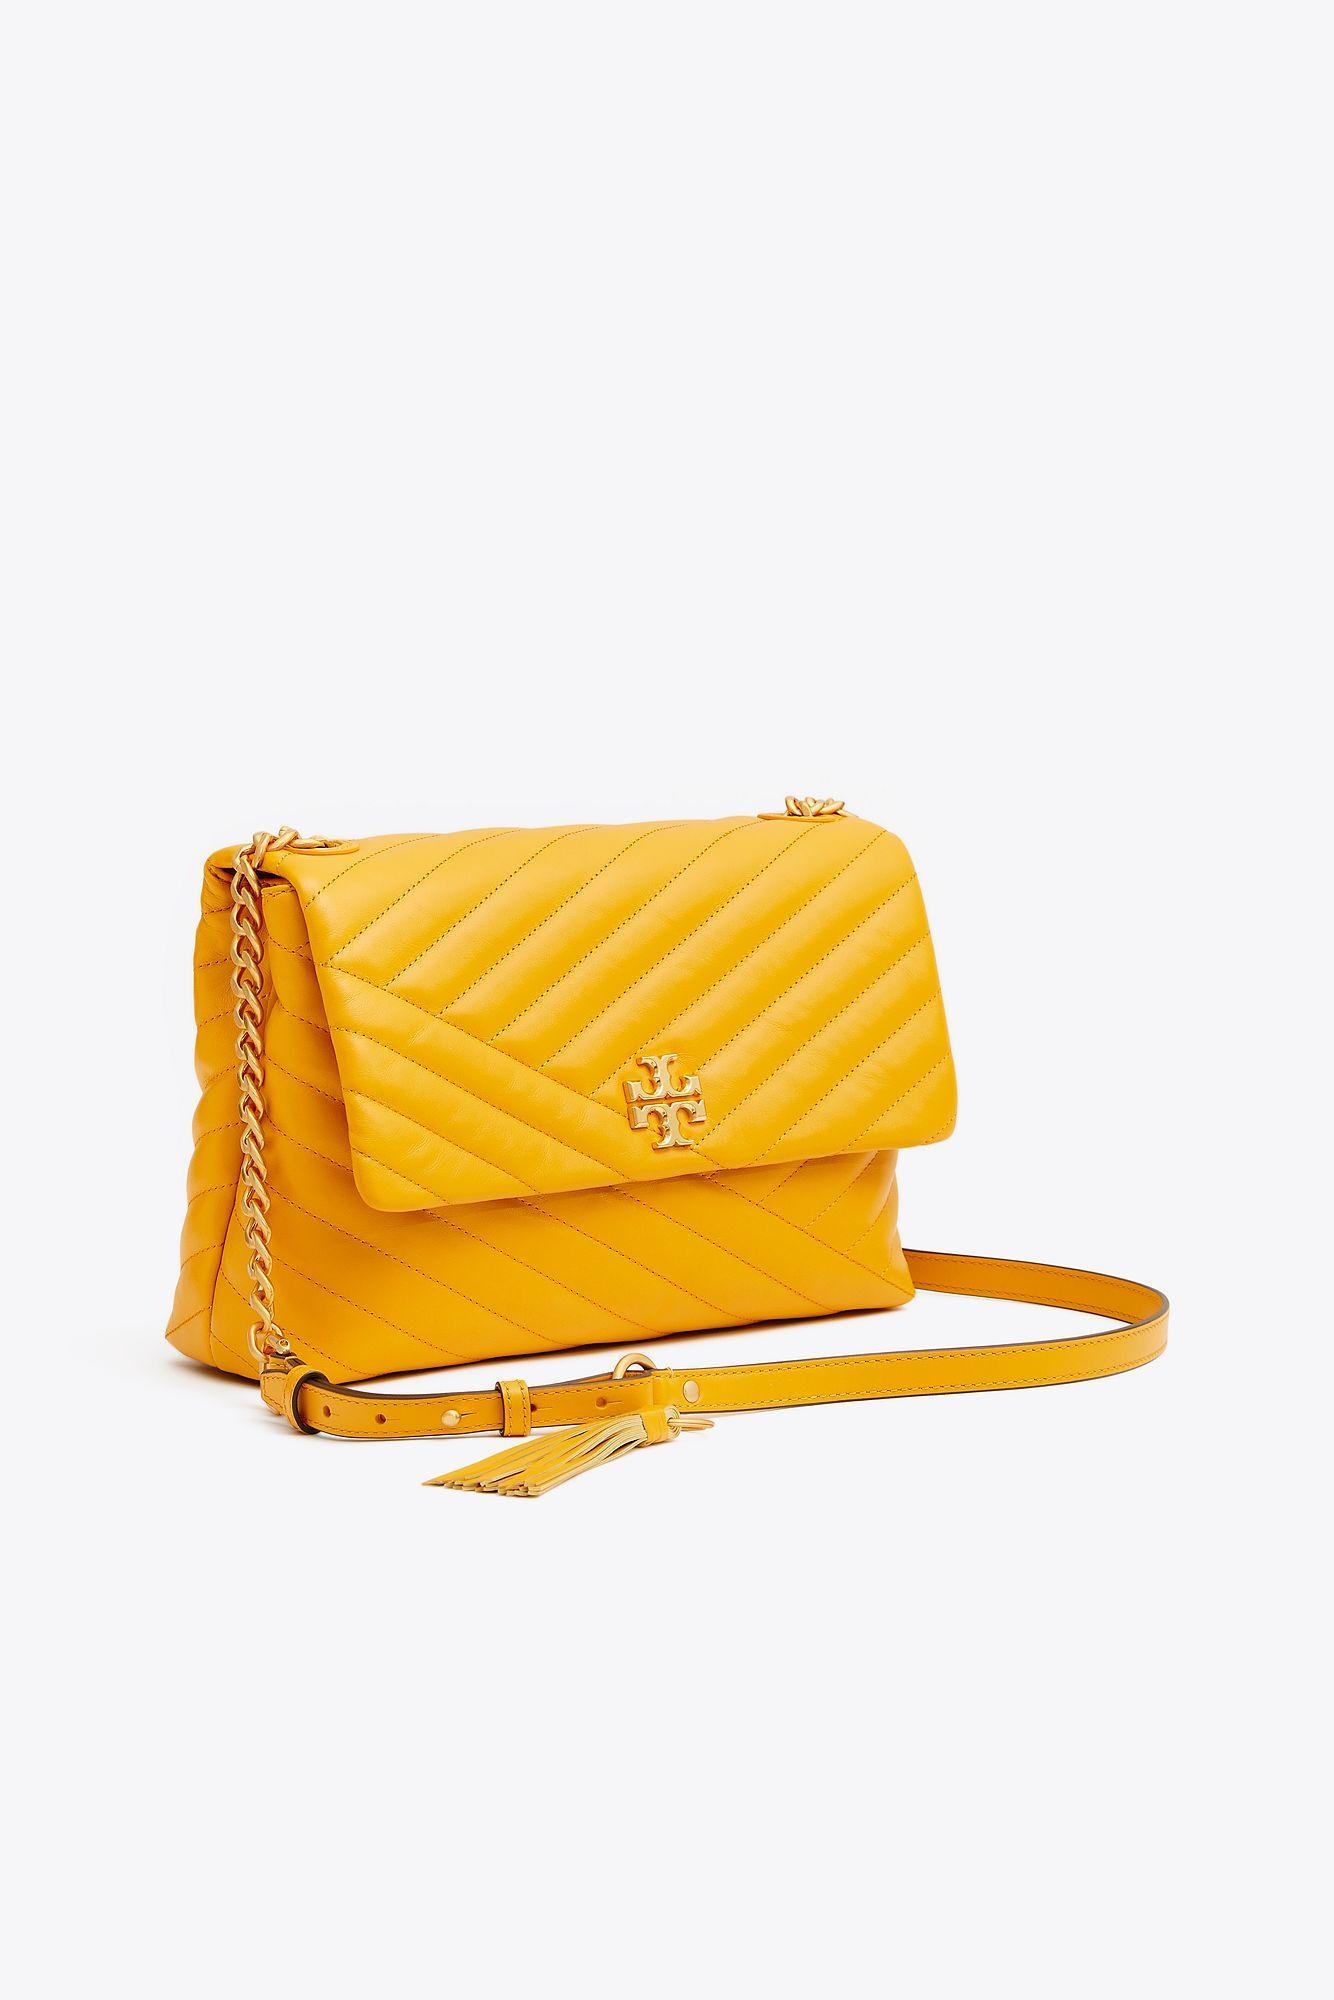 74ab93712c2c Tory Burch Kira Chevron Flap Shoulder Bag in Yellow - Save 18% - Lyst